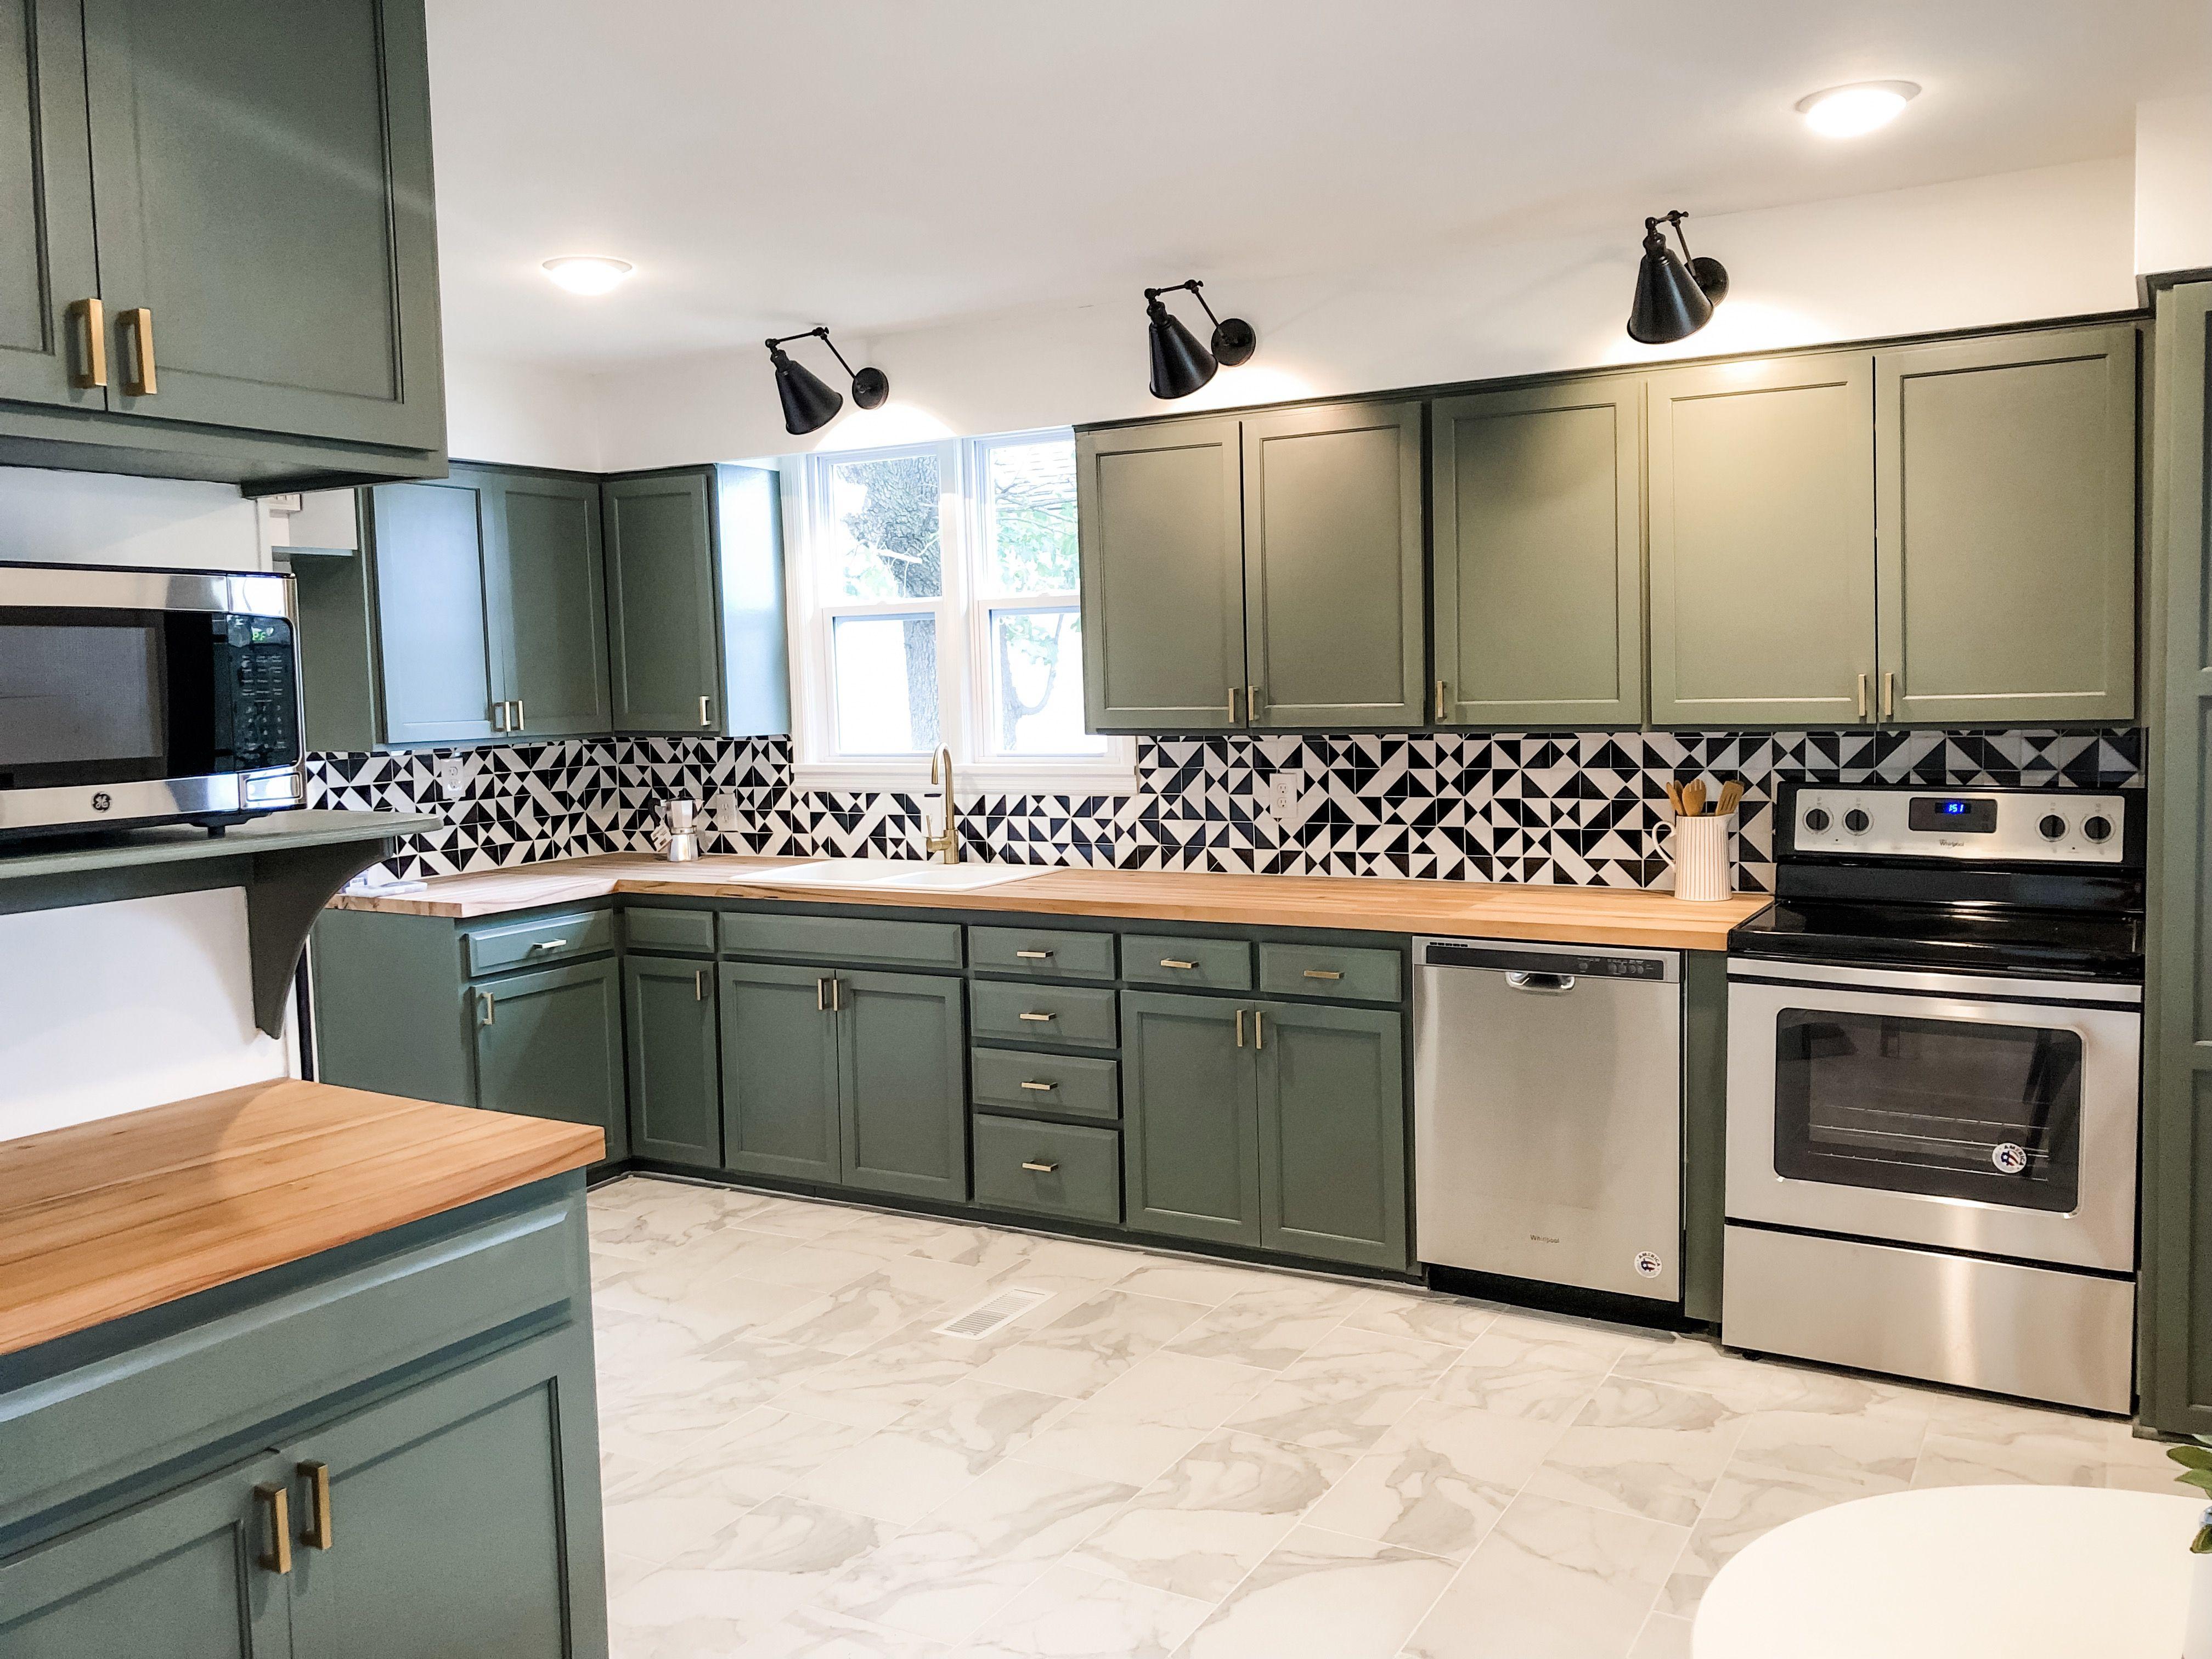 Wall Street Kitchen Kitchen Remodel Small Green Cabinets Green Kitchen Cabinets